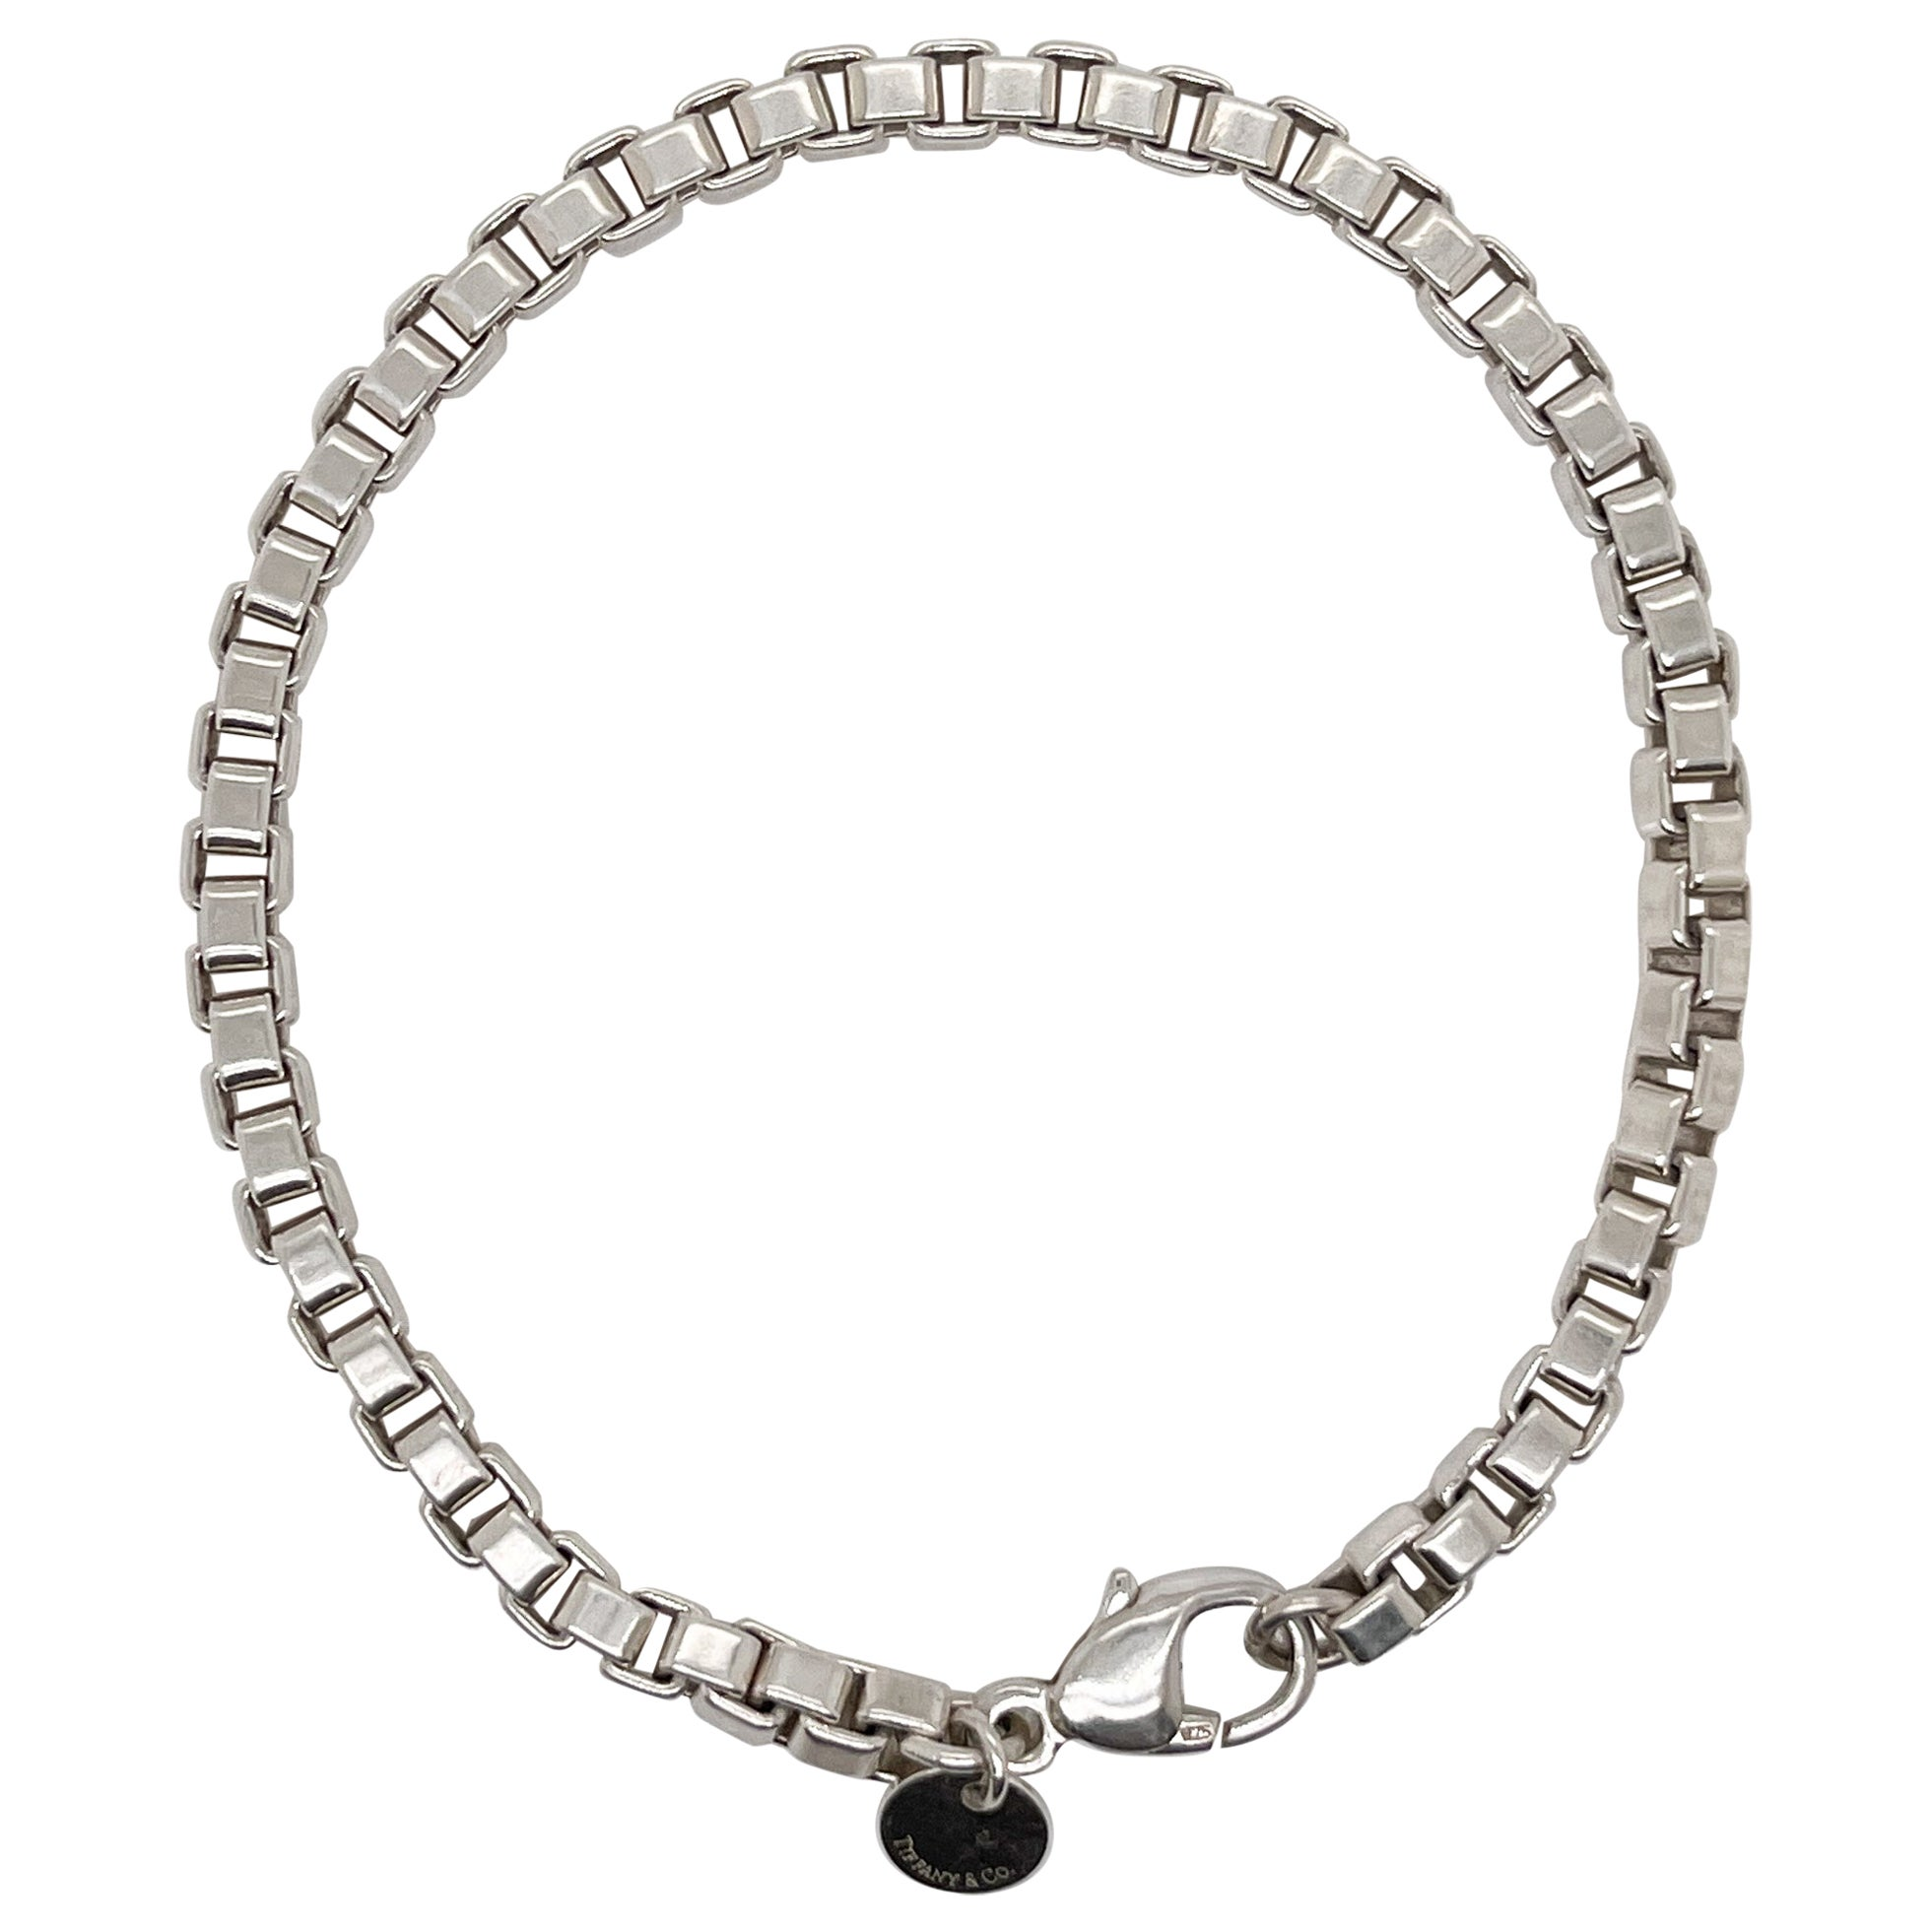 Vintage Tiffany & Co. Venetian Box Link Sterling Silver Bracelet